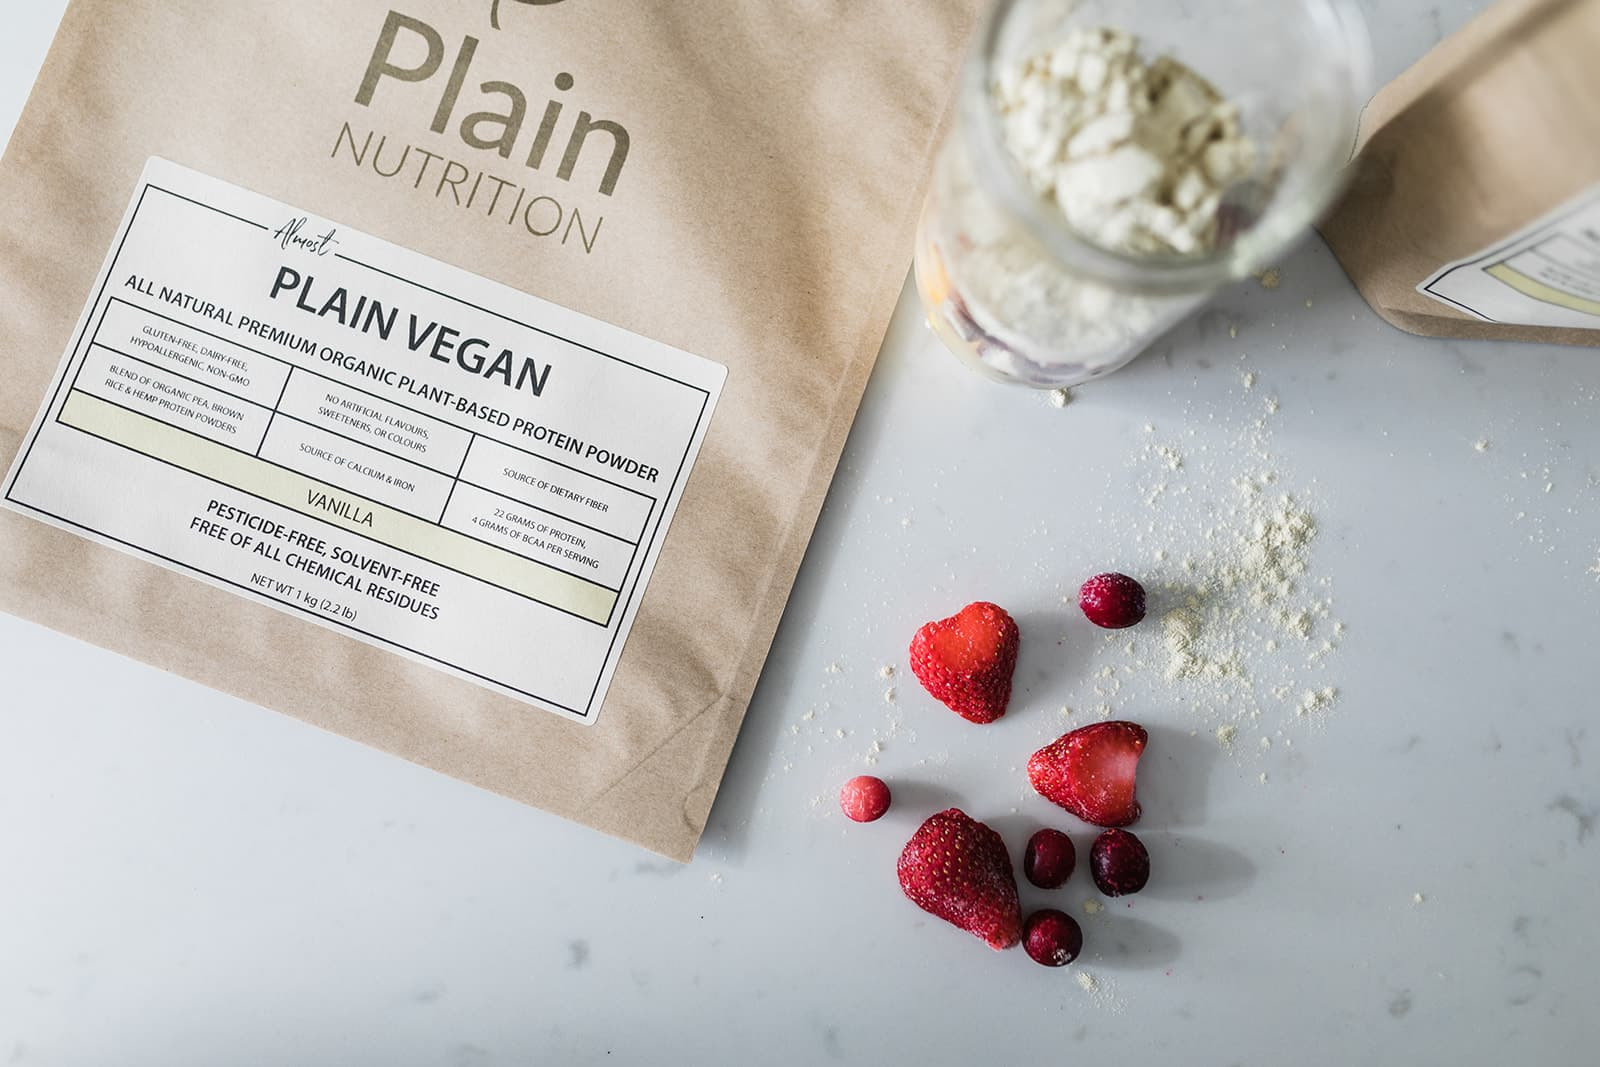 Why do vegans use protein powder?